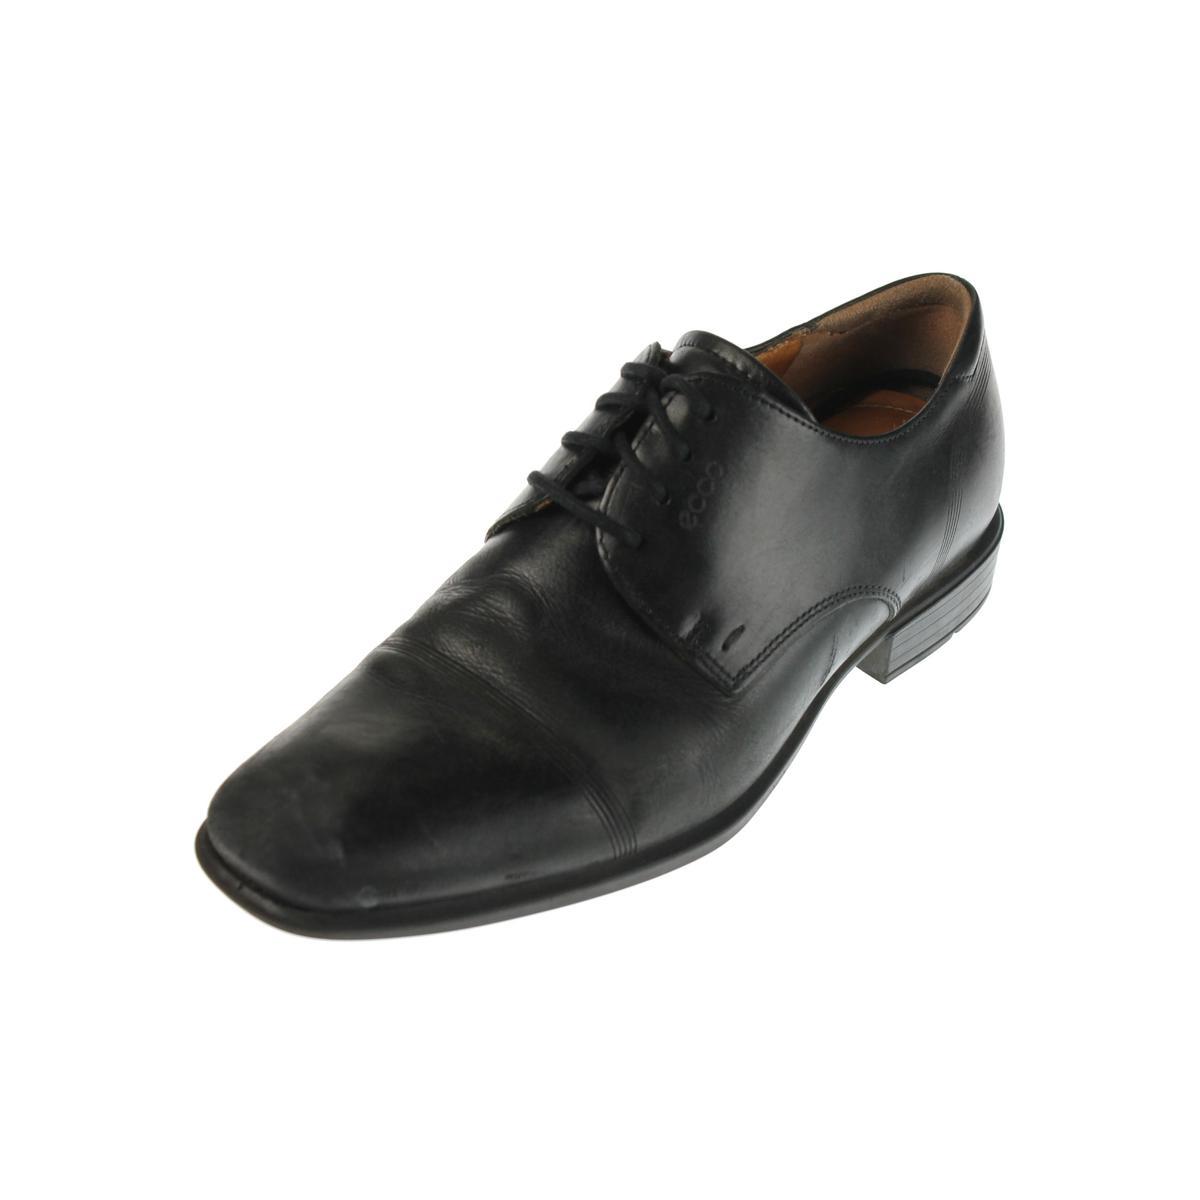 ecco 7351 mens cairo cap toe black leather dress derby